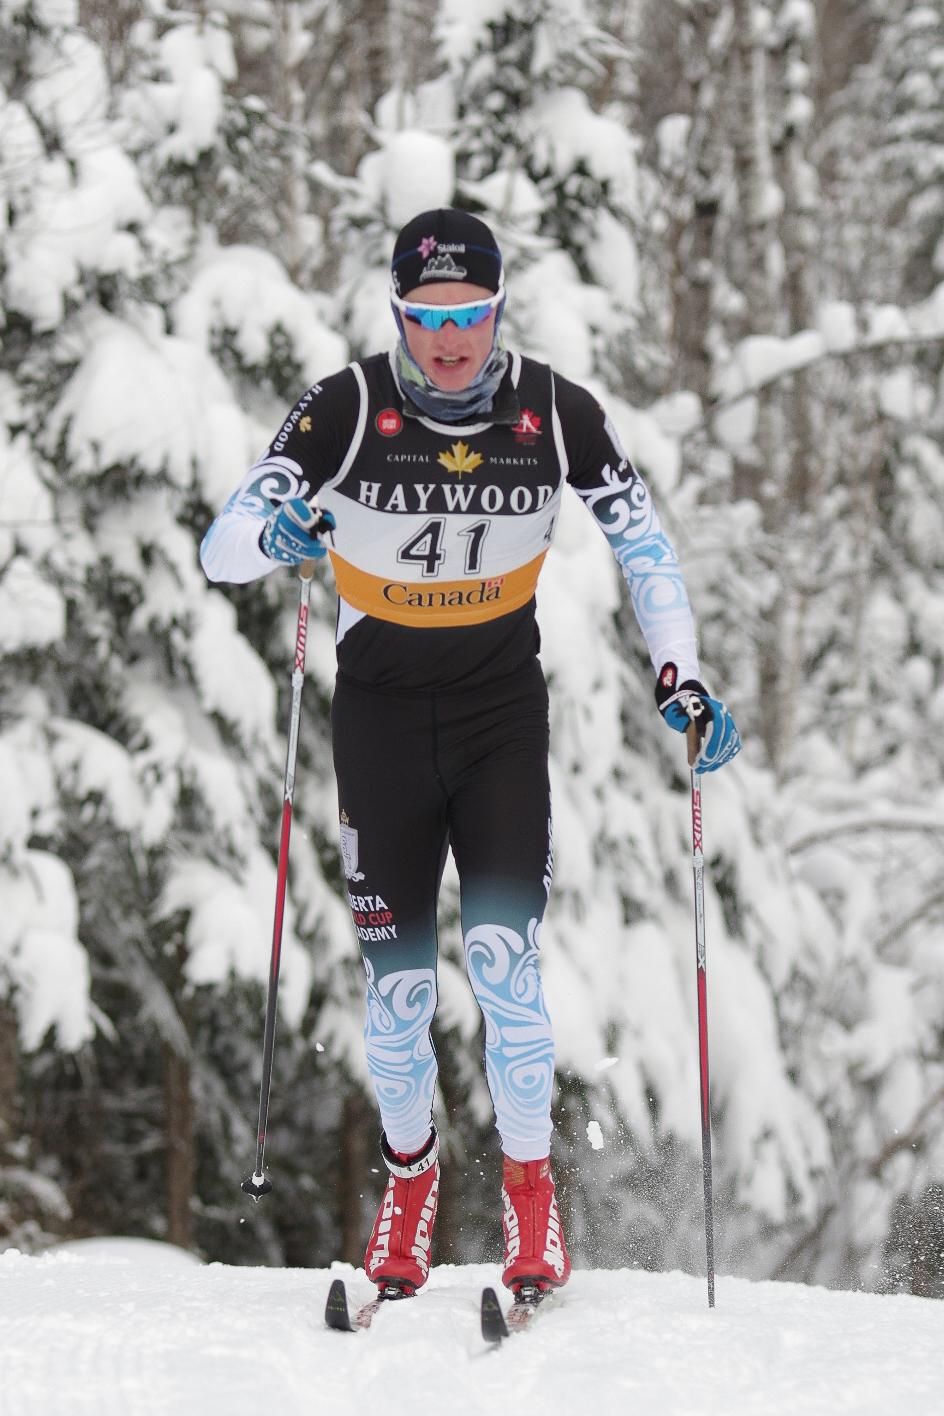 15km Classic Photo: Martin Kaiser